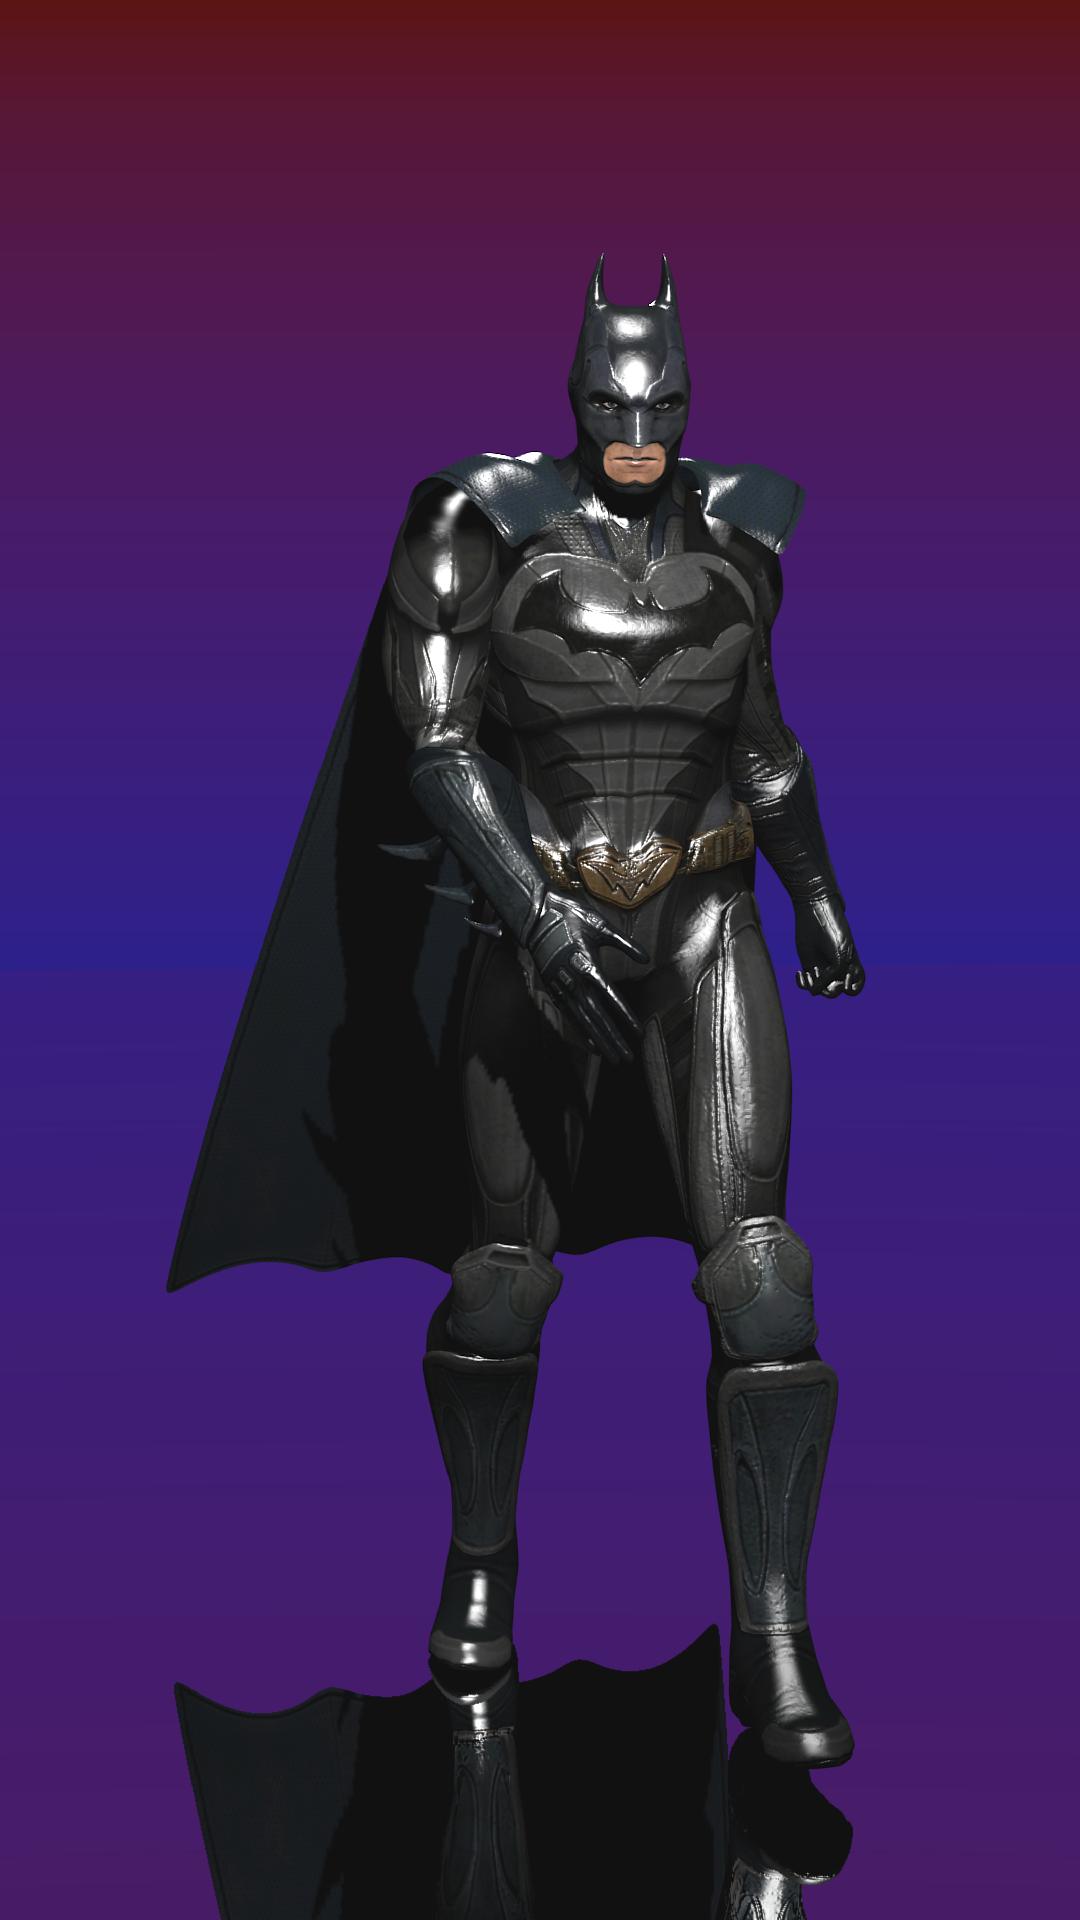 Batman From Injustice 2 Gods Among Us 3d Model Fully Textured Fully Rigged Batman Art 3d Model